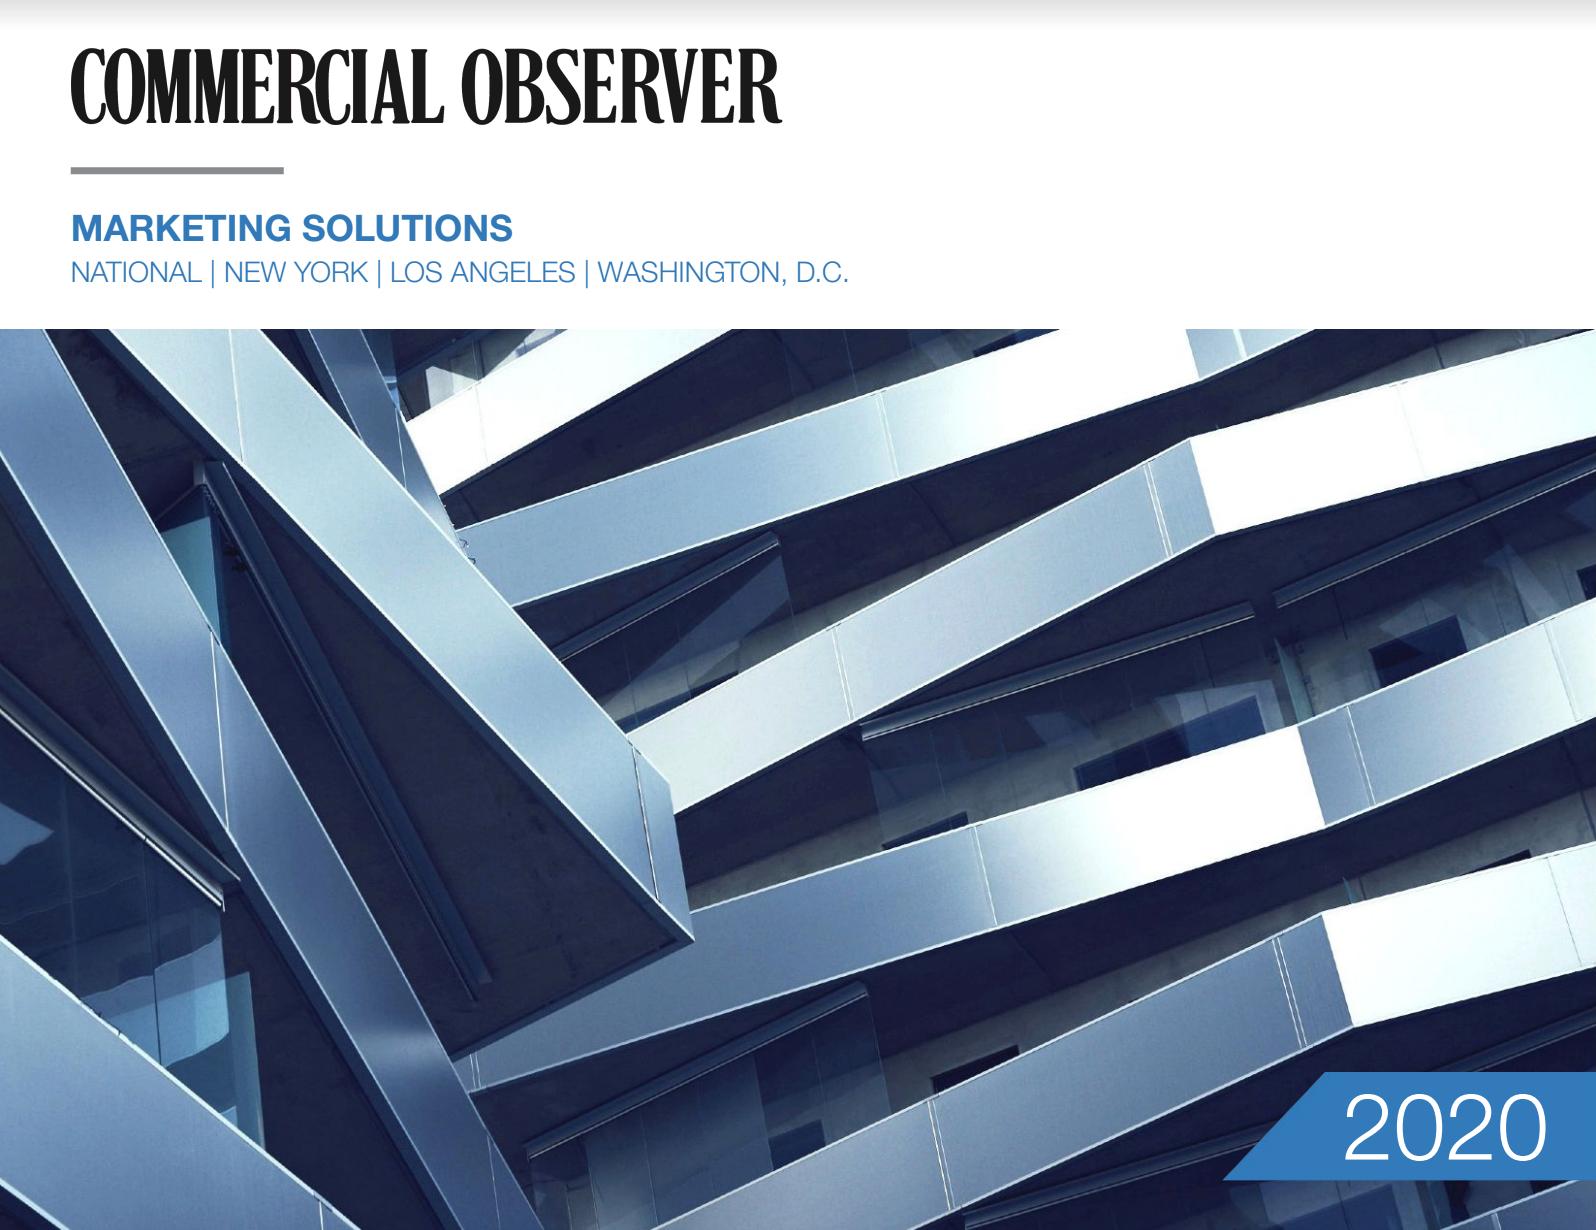 Commercial Observer Marketing Solutions Media Kit 2019